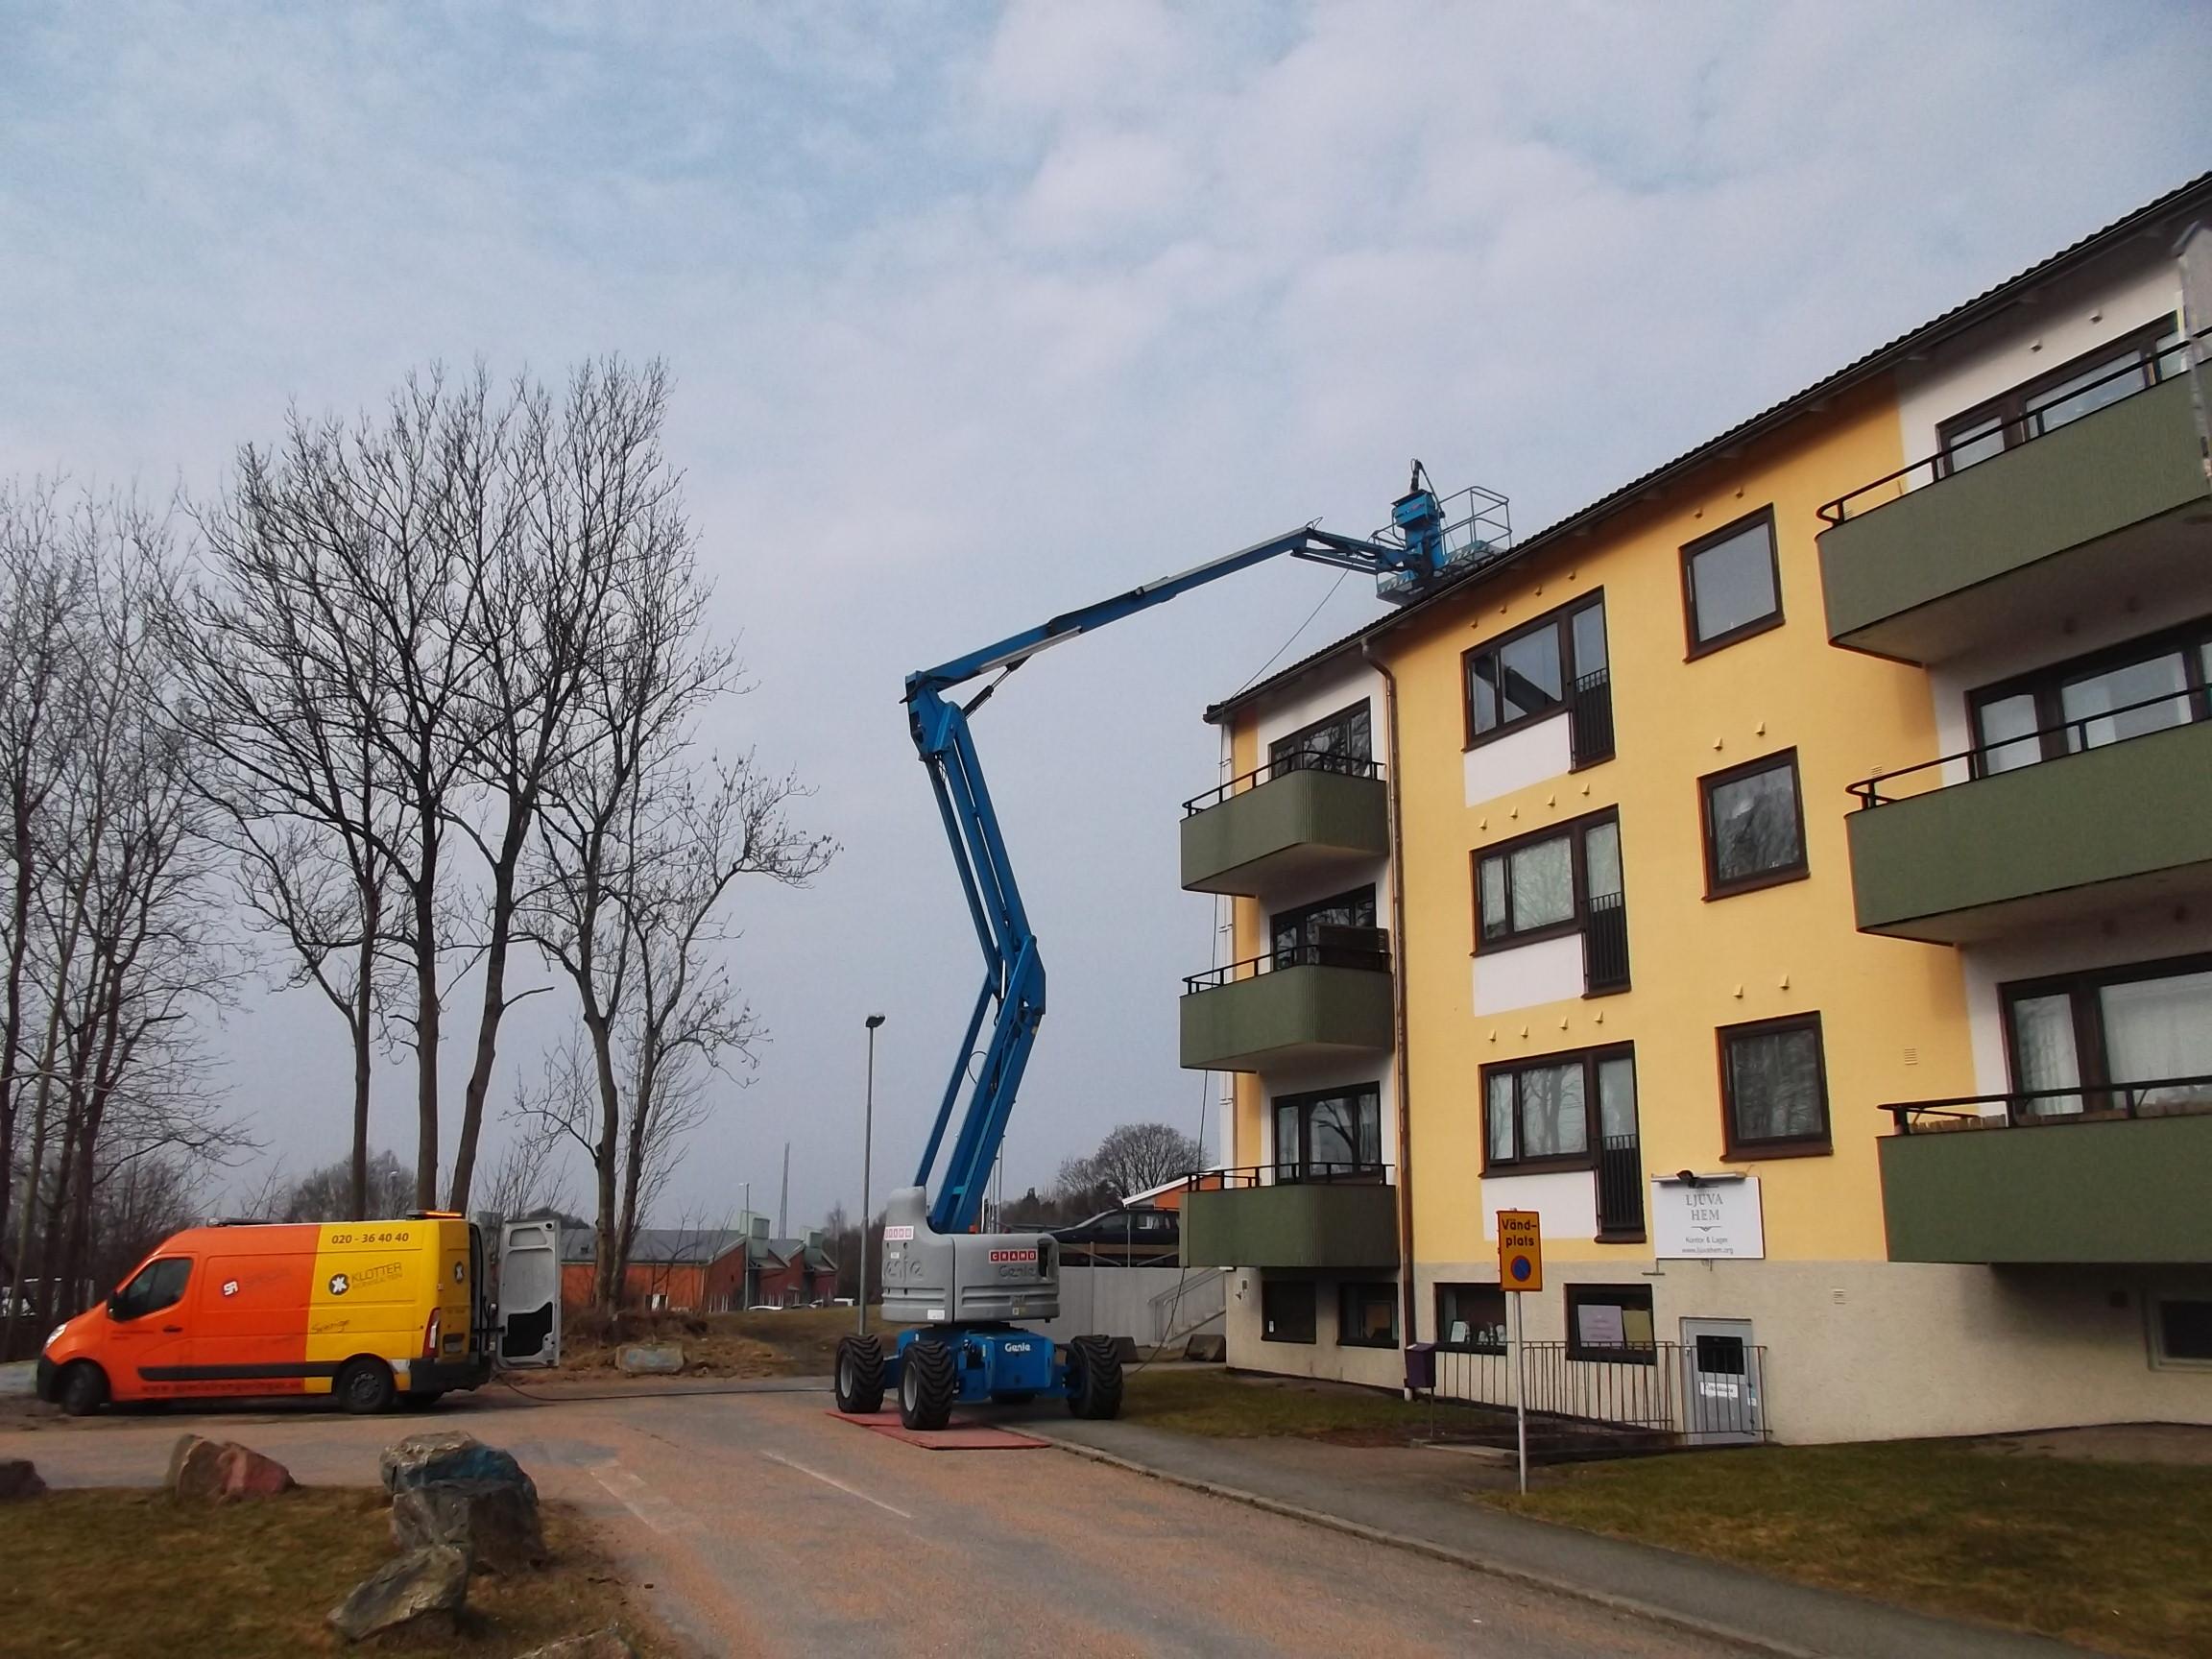 2018 ledsagare litet bröst i Göteborg